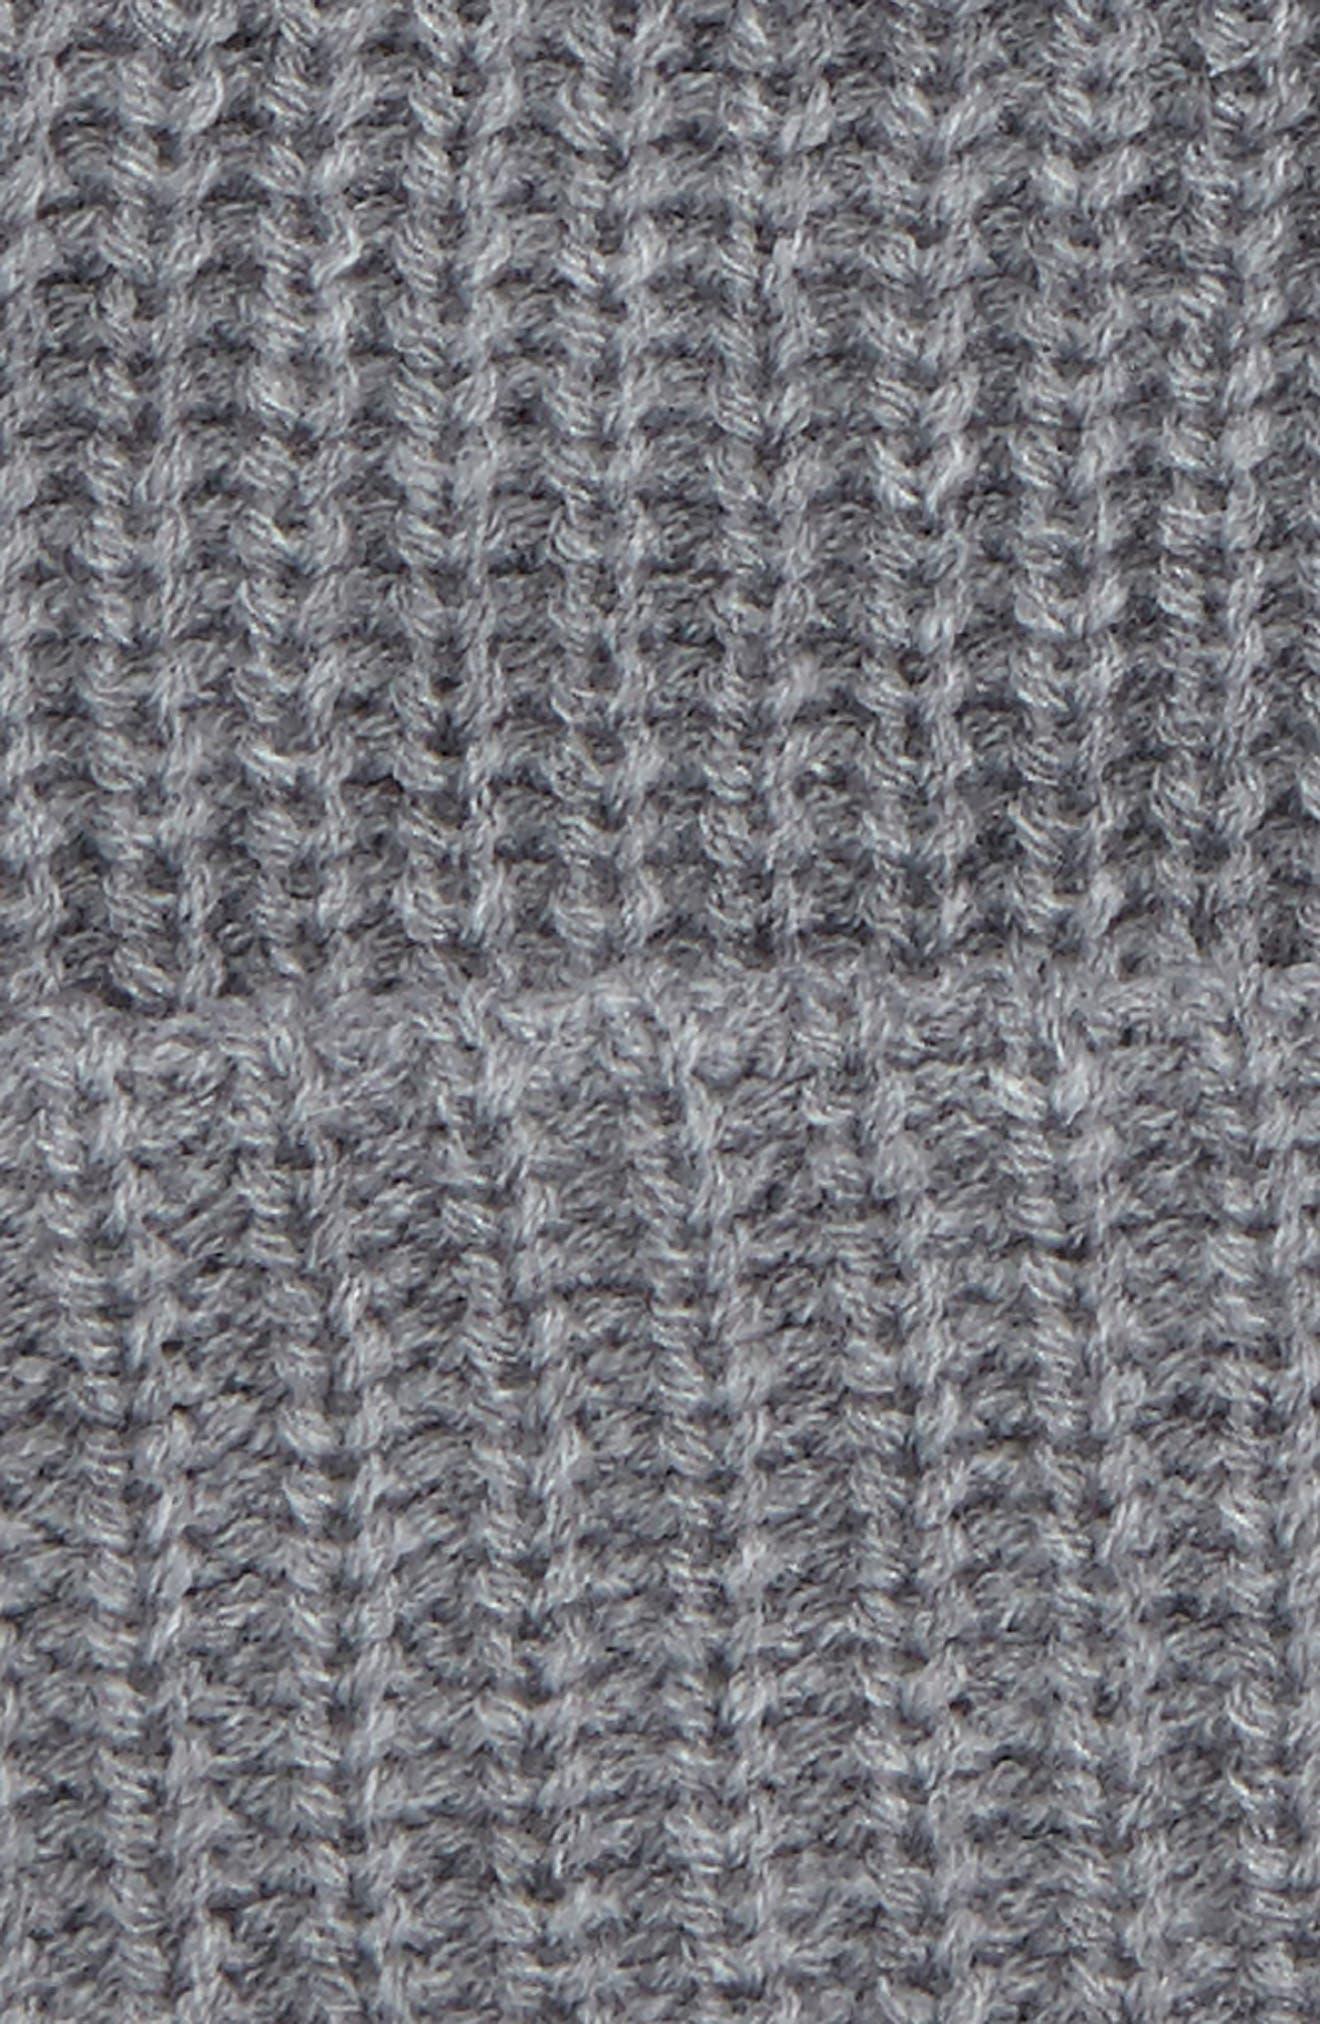 Pittsfield Knit Cap,                             Alternate thumbnail 2, color,                             020